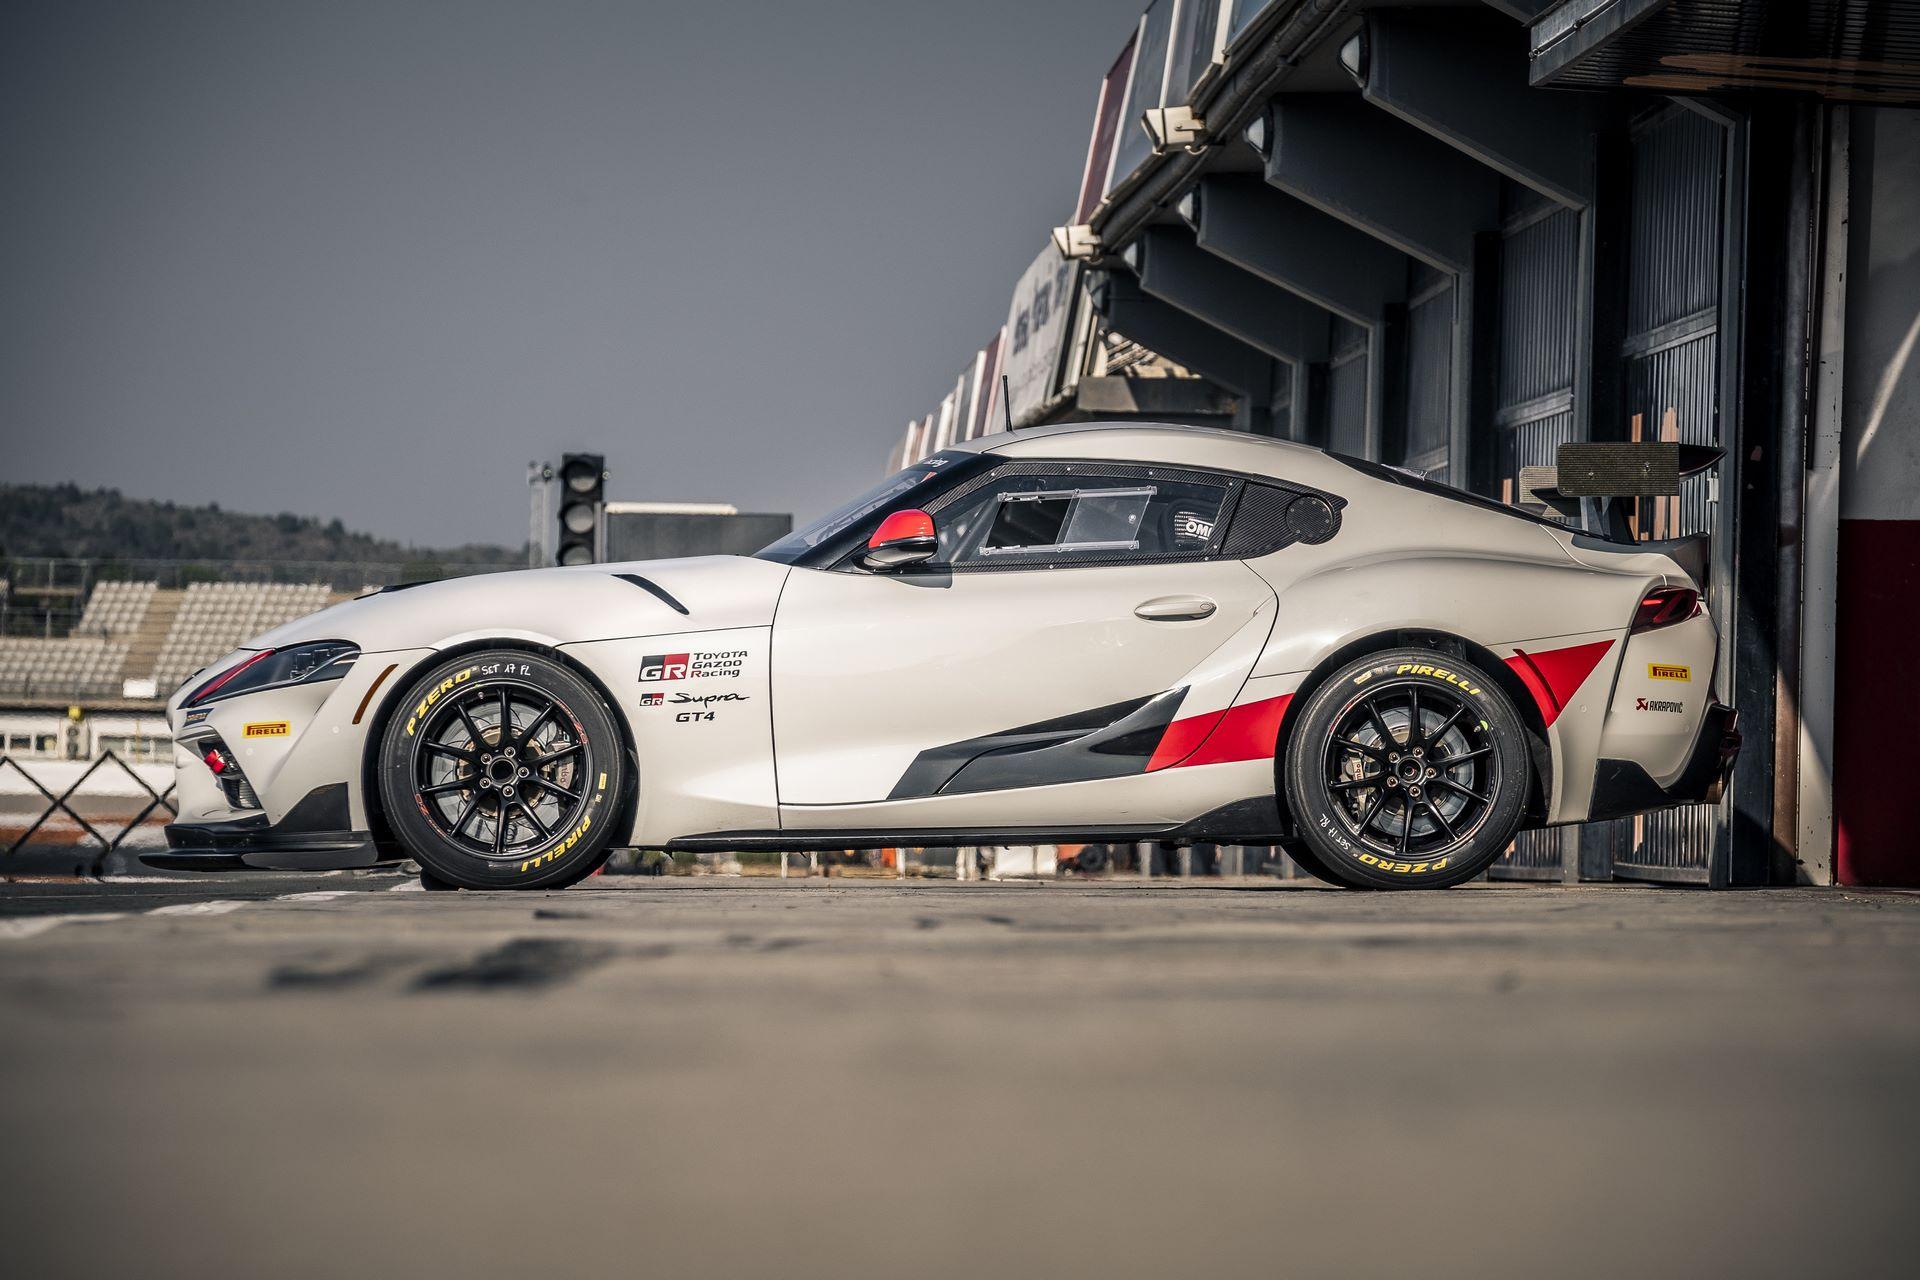 Toyota-Supra-GT4-2